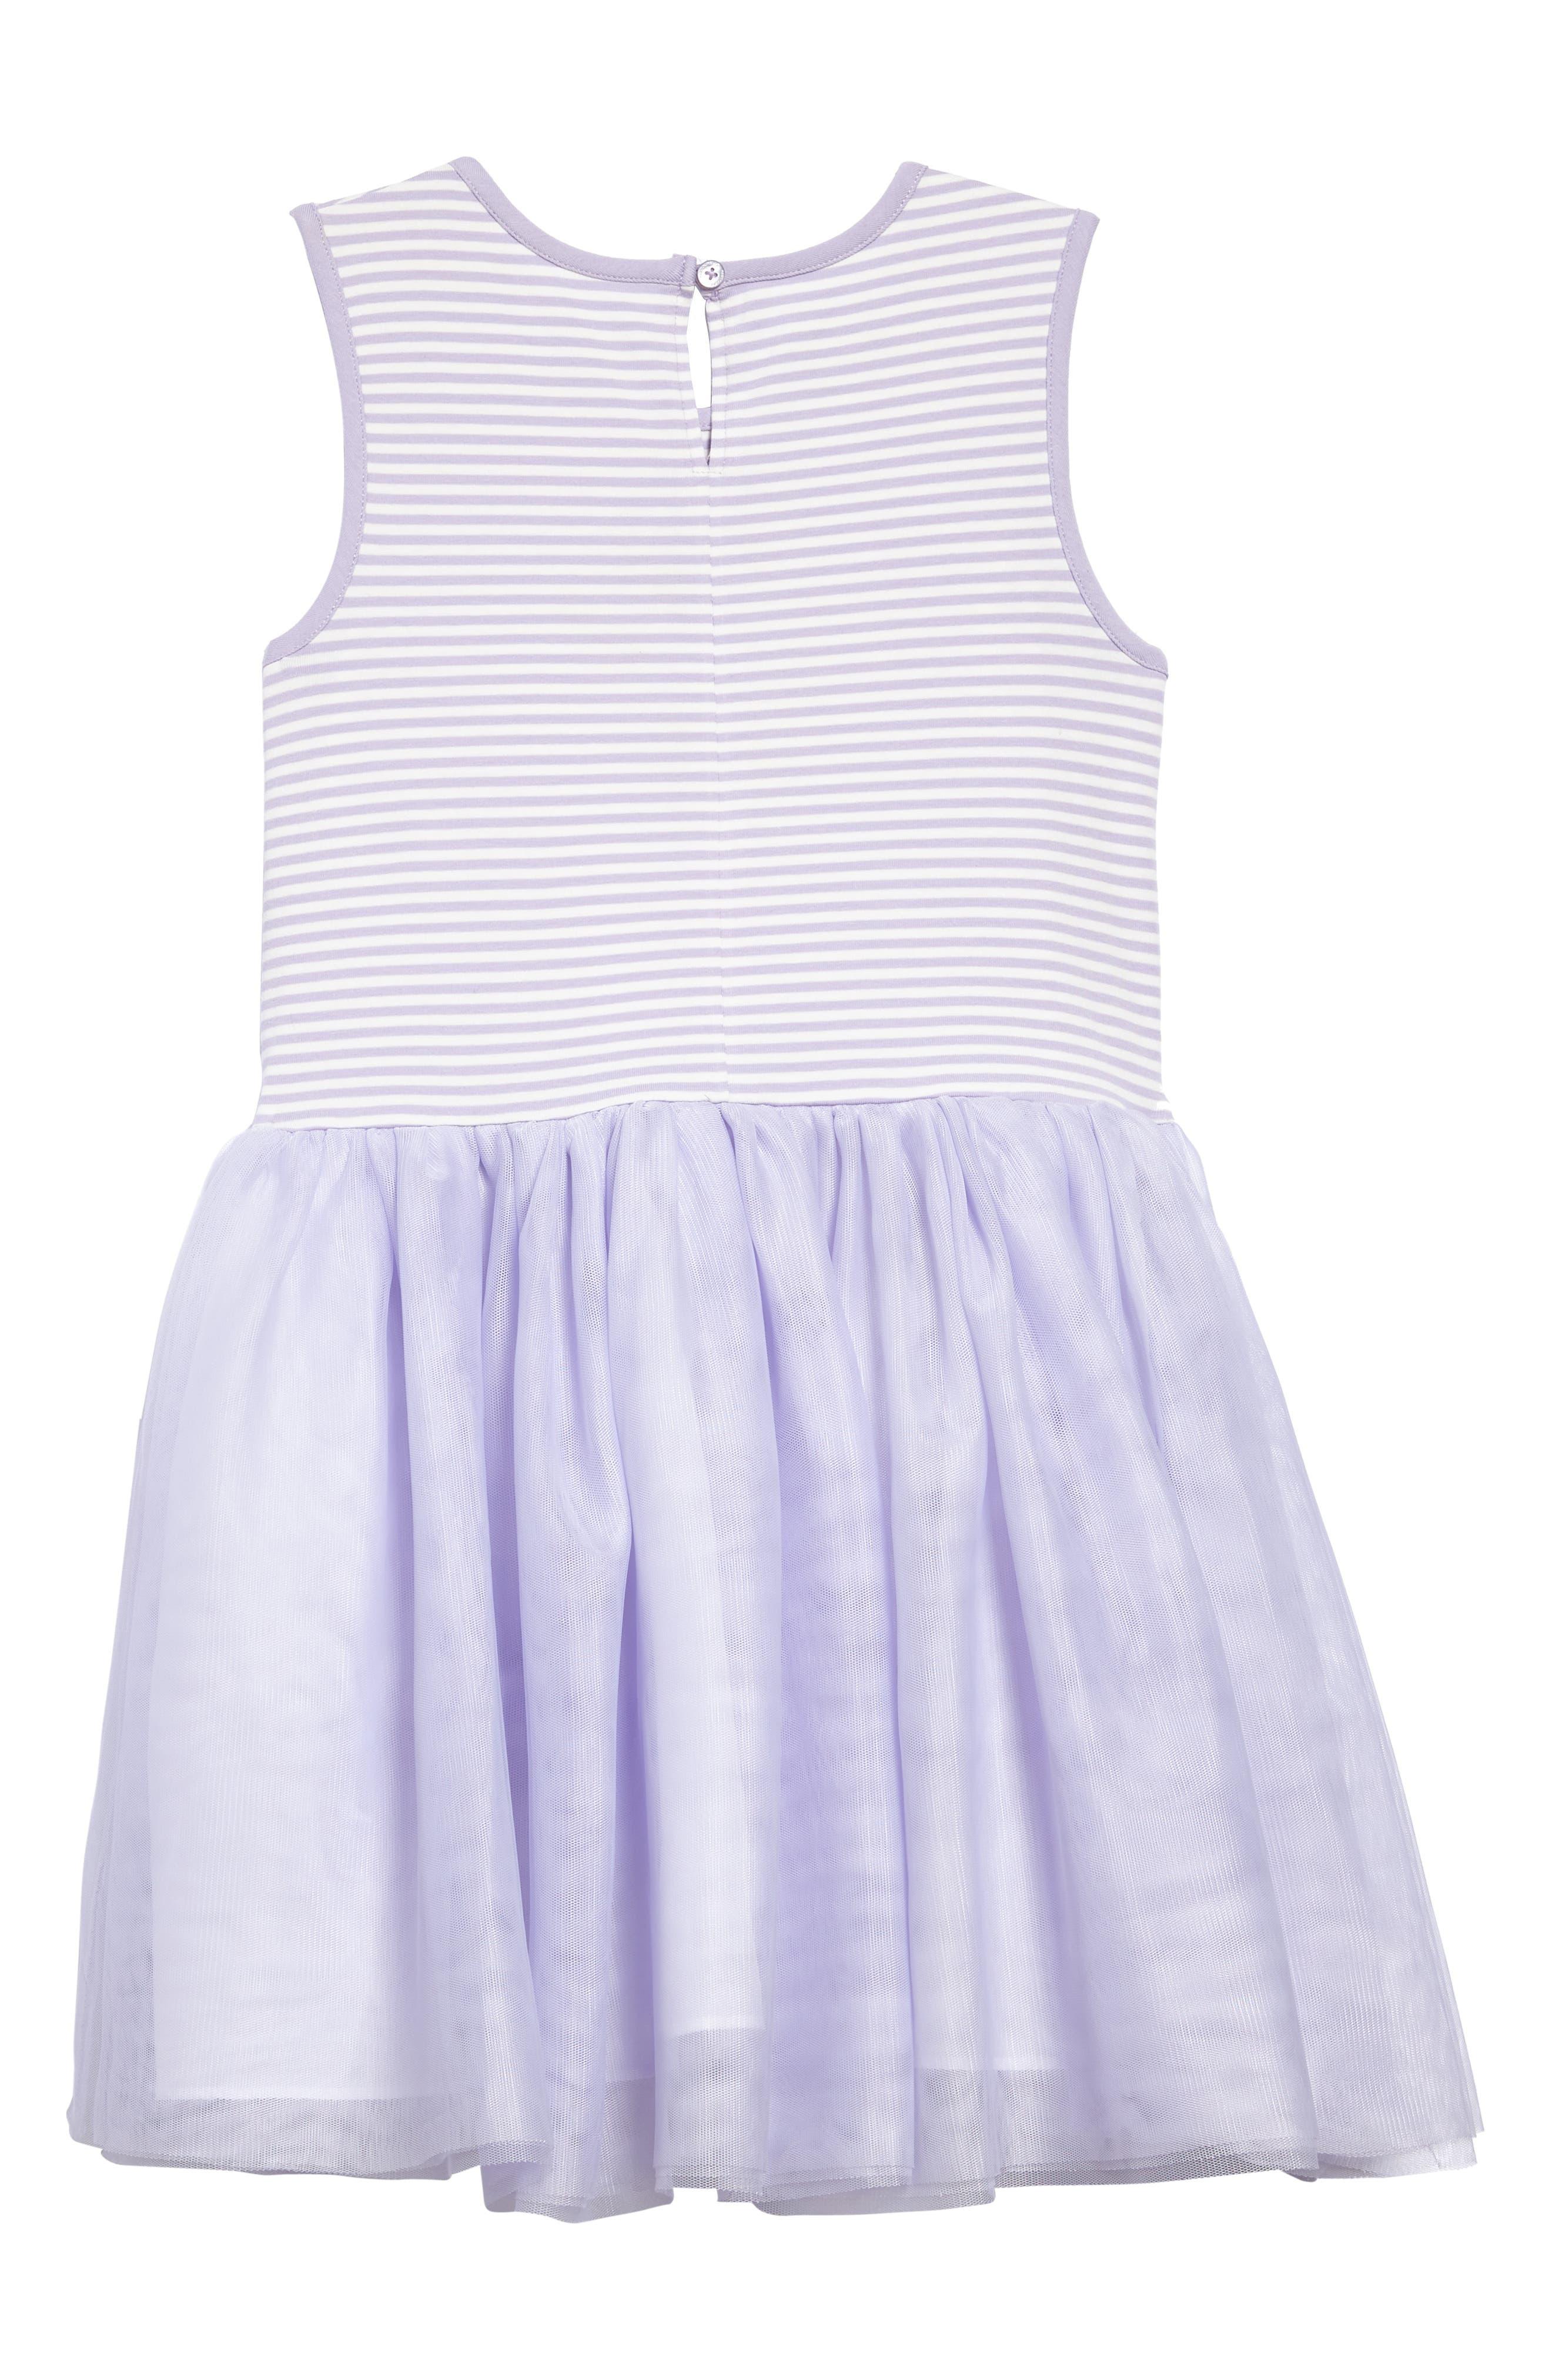 Sleeveless Tutu Dress,                             Alternate thumbnail 2, color,                             Lavender/ White